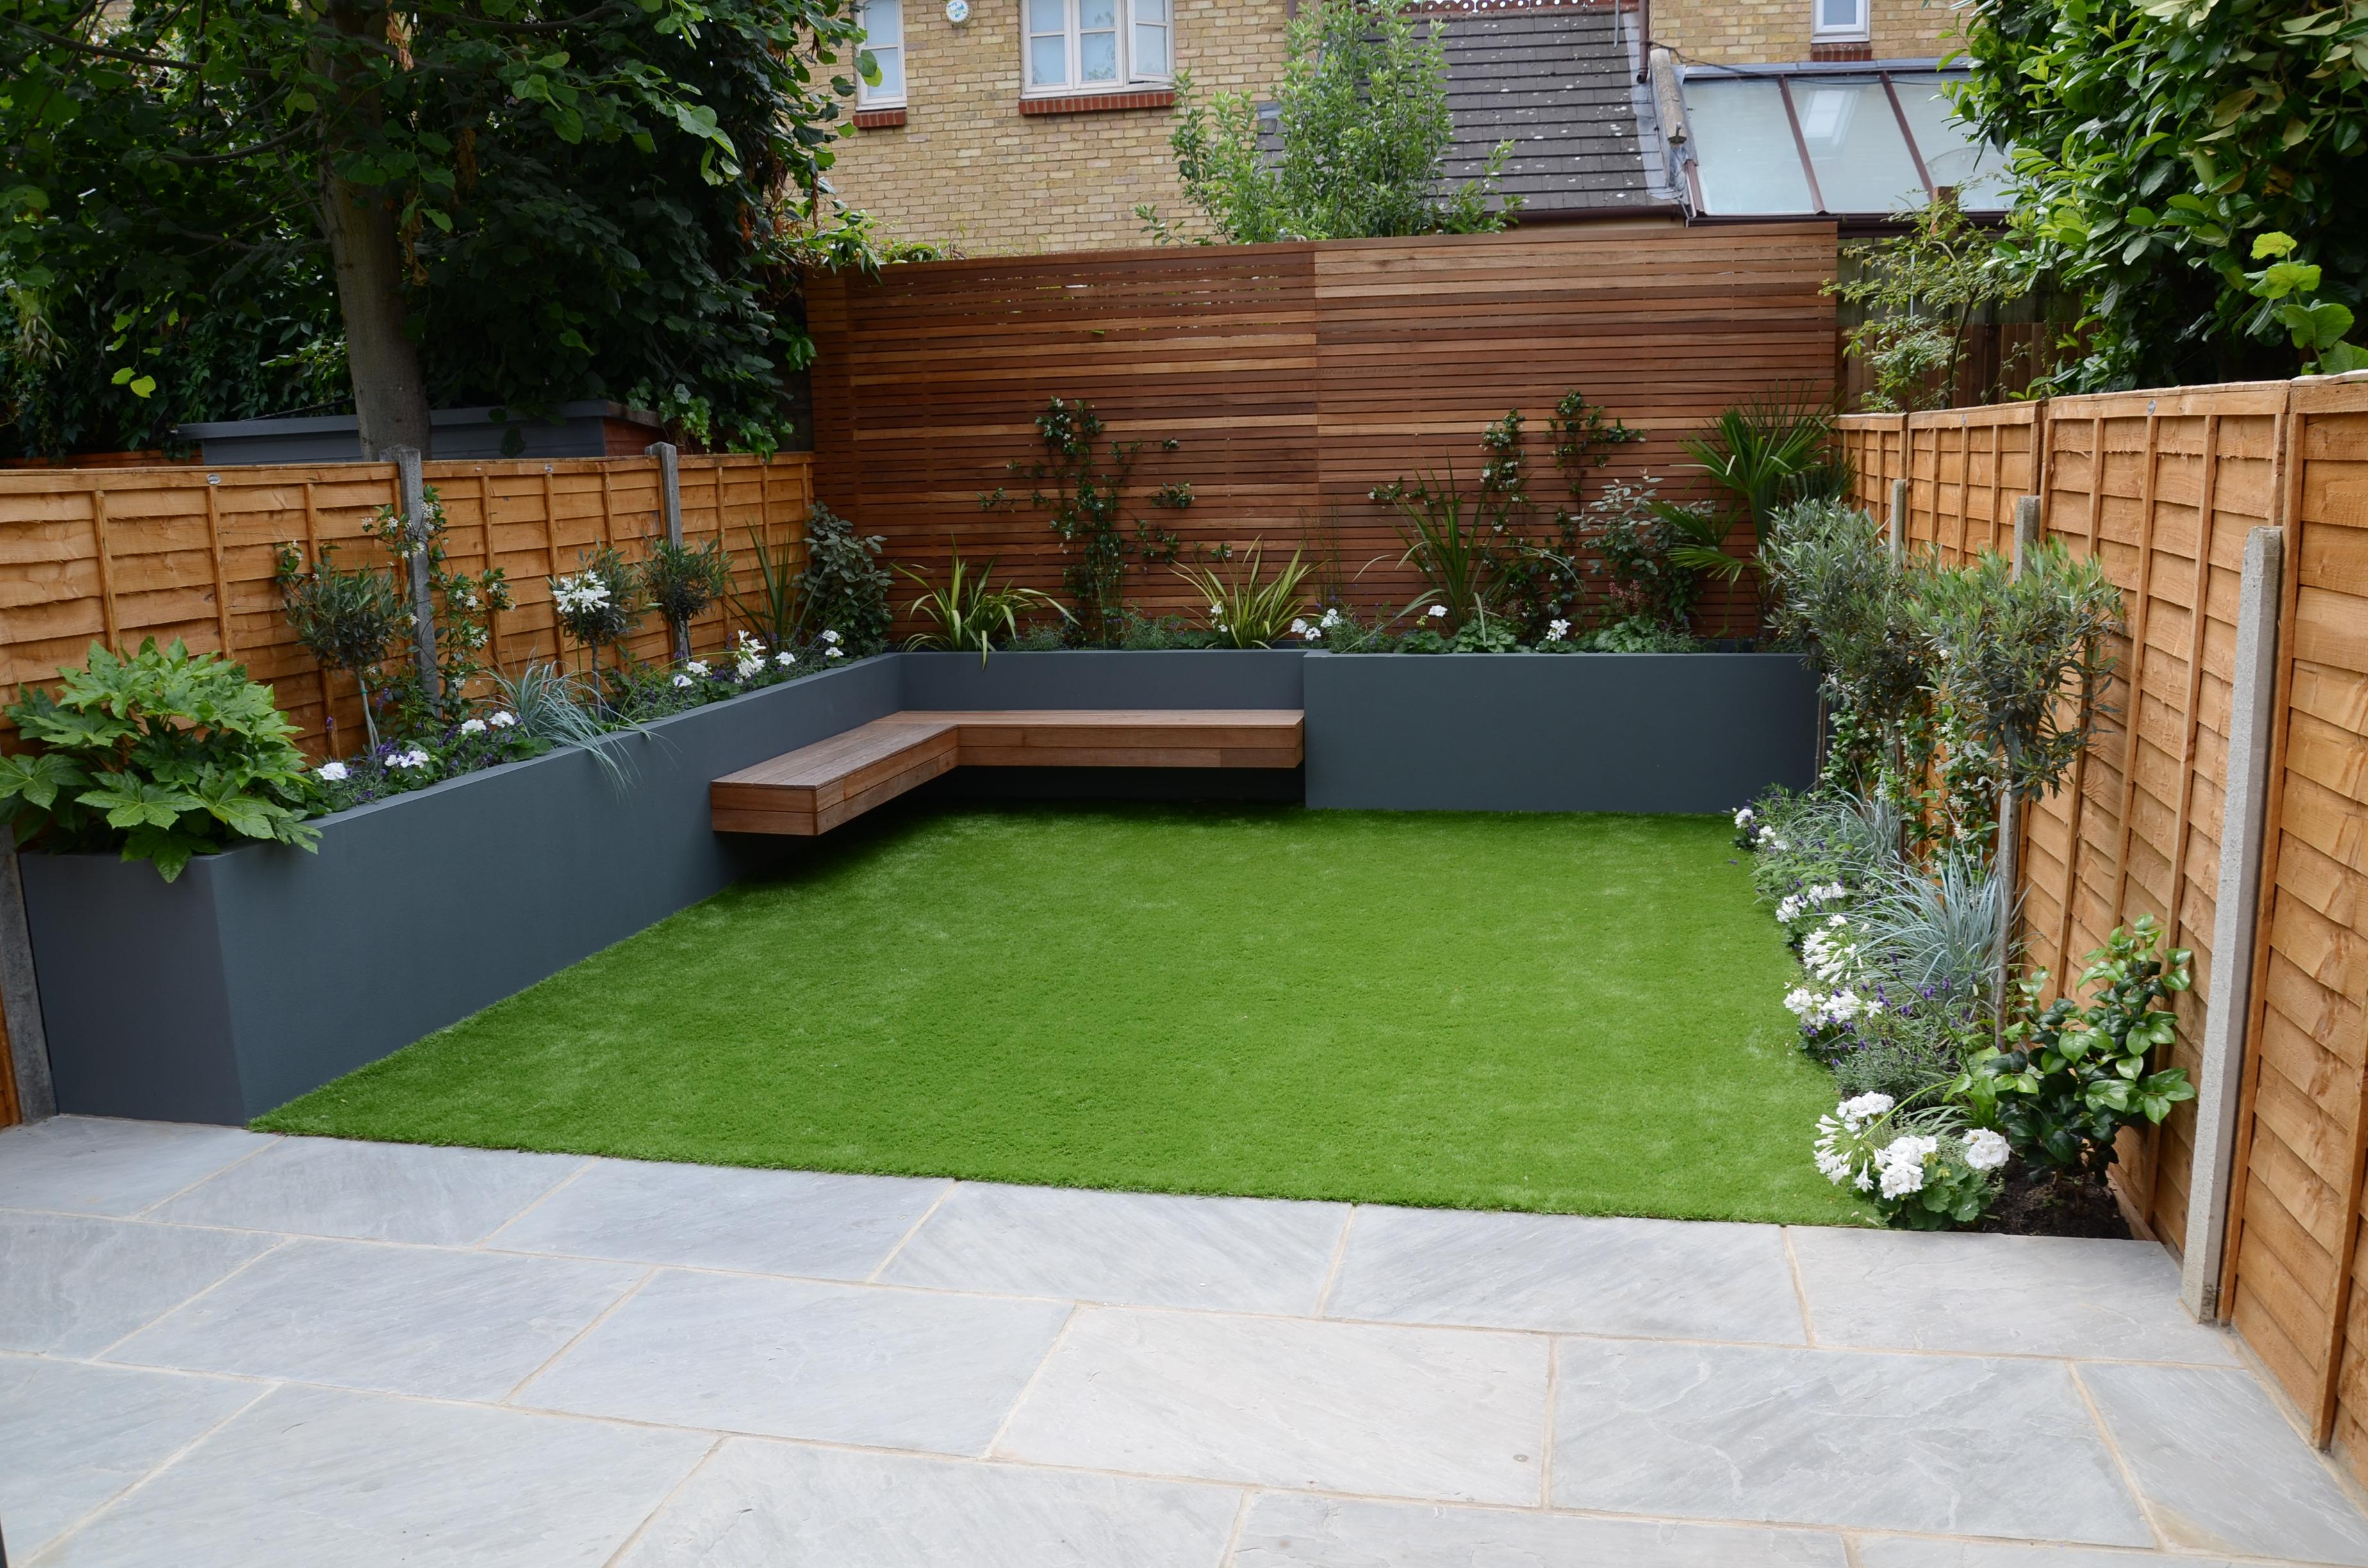 Garden Design chelsea screen raised beds wonderful ...